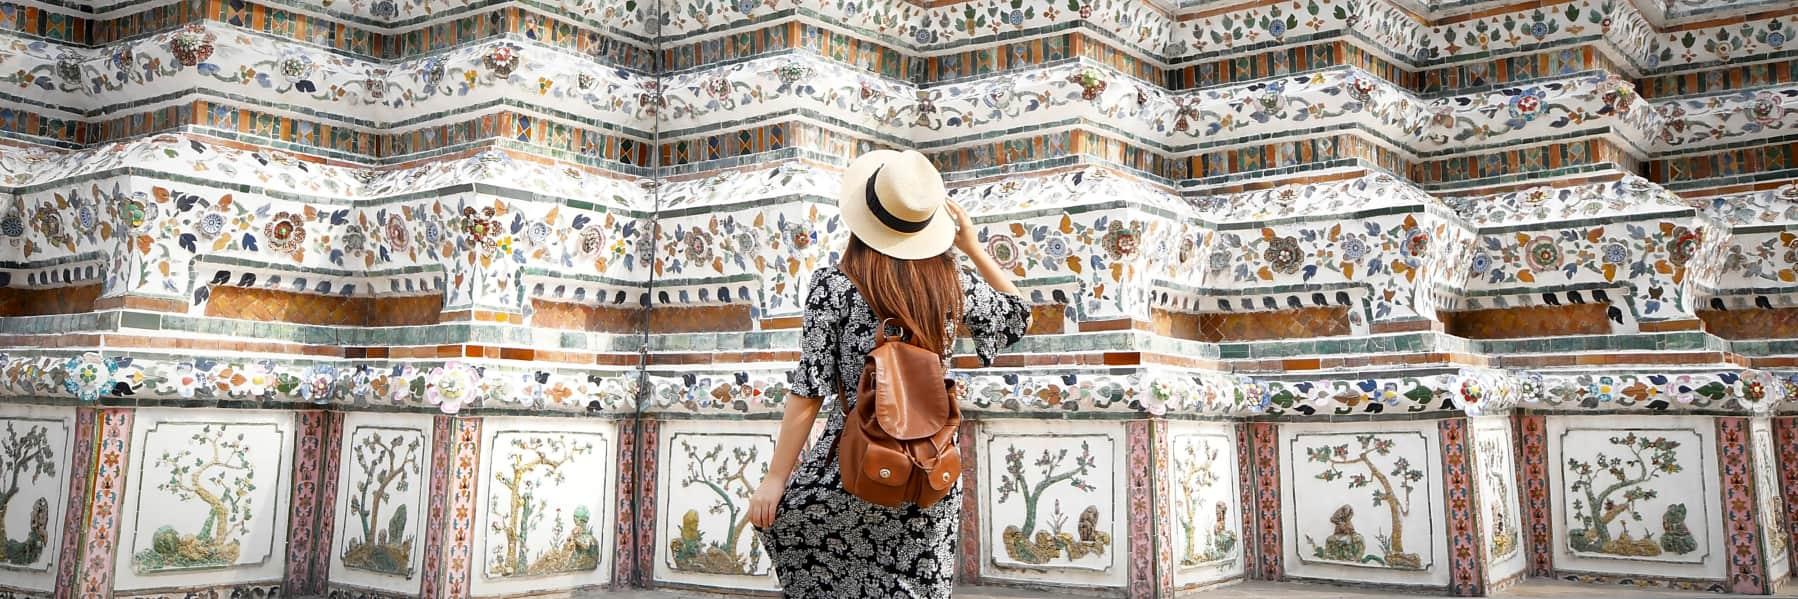 Bangkok Temples Instagram Tour: Wat Arun, Wat Pho & Wat Saket (Small Group)– Half Day gallery